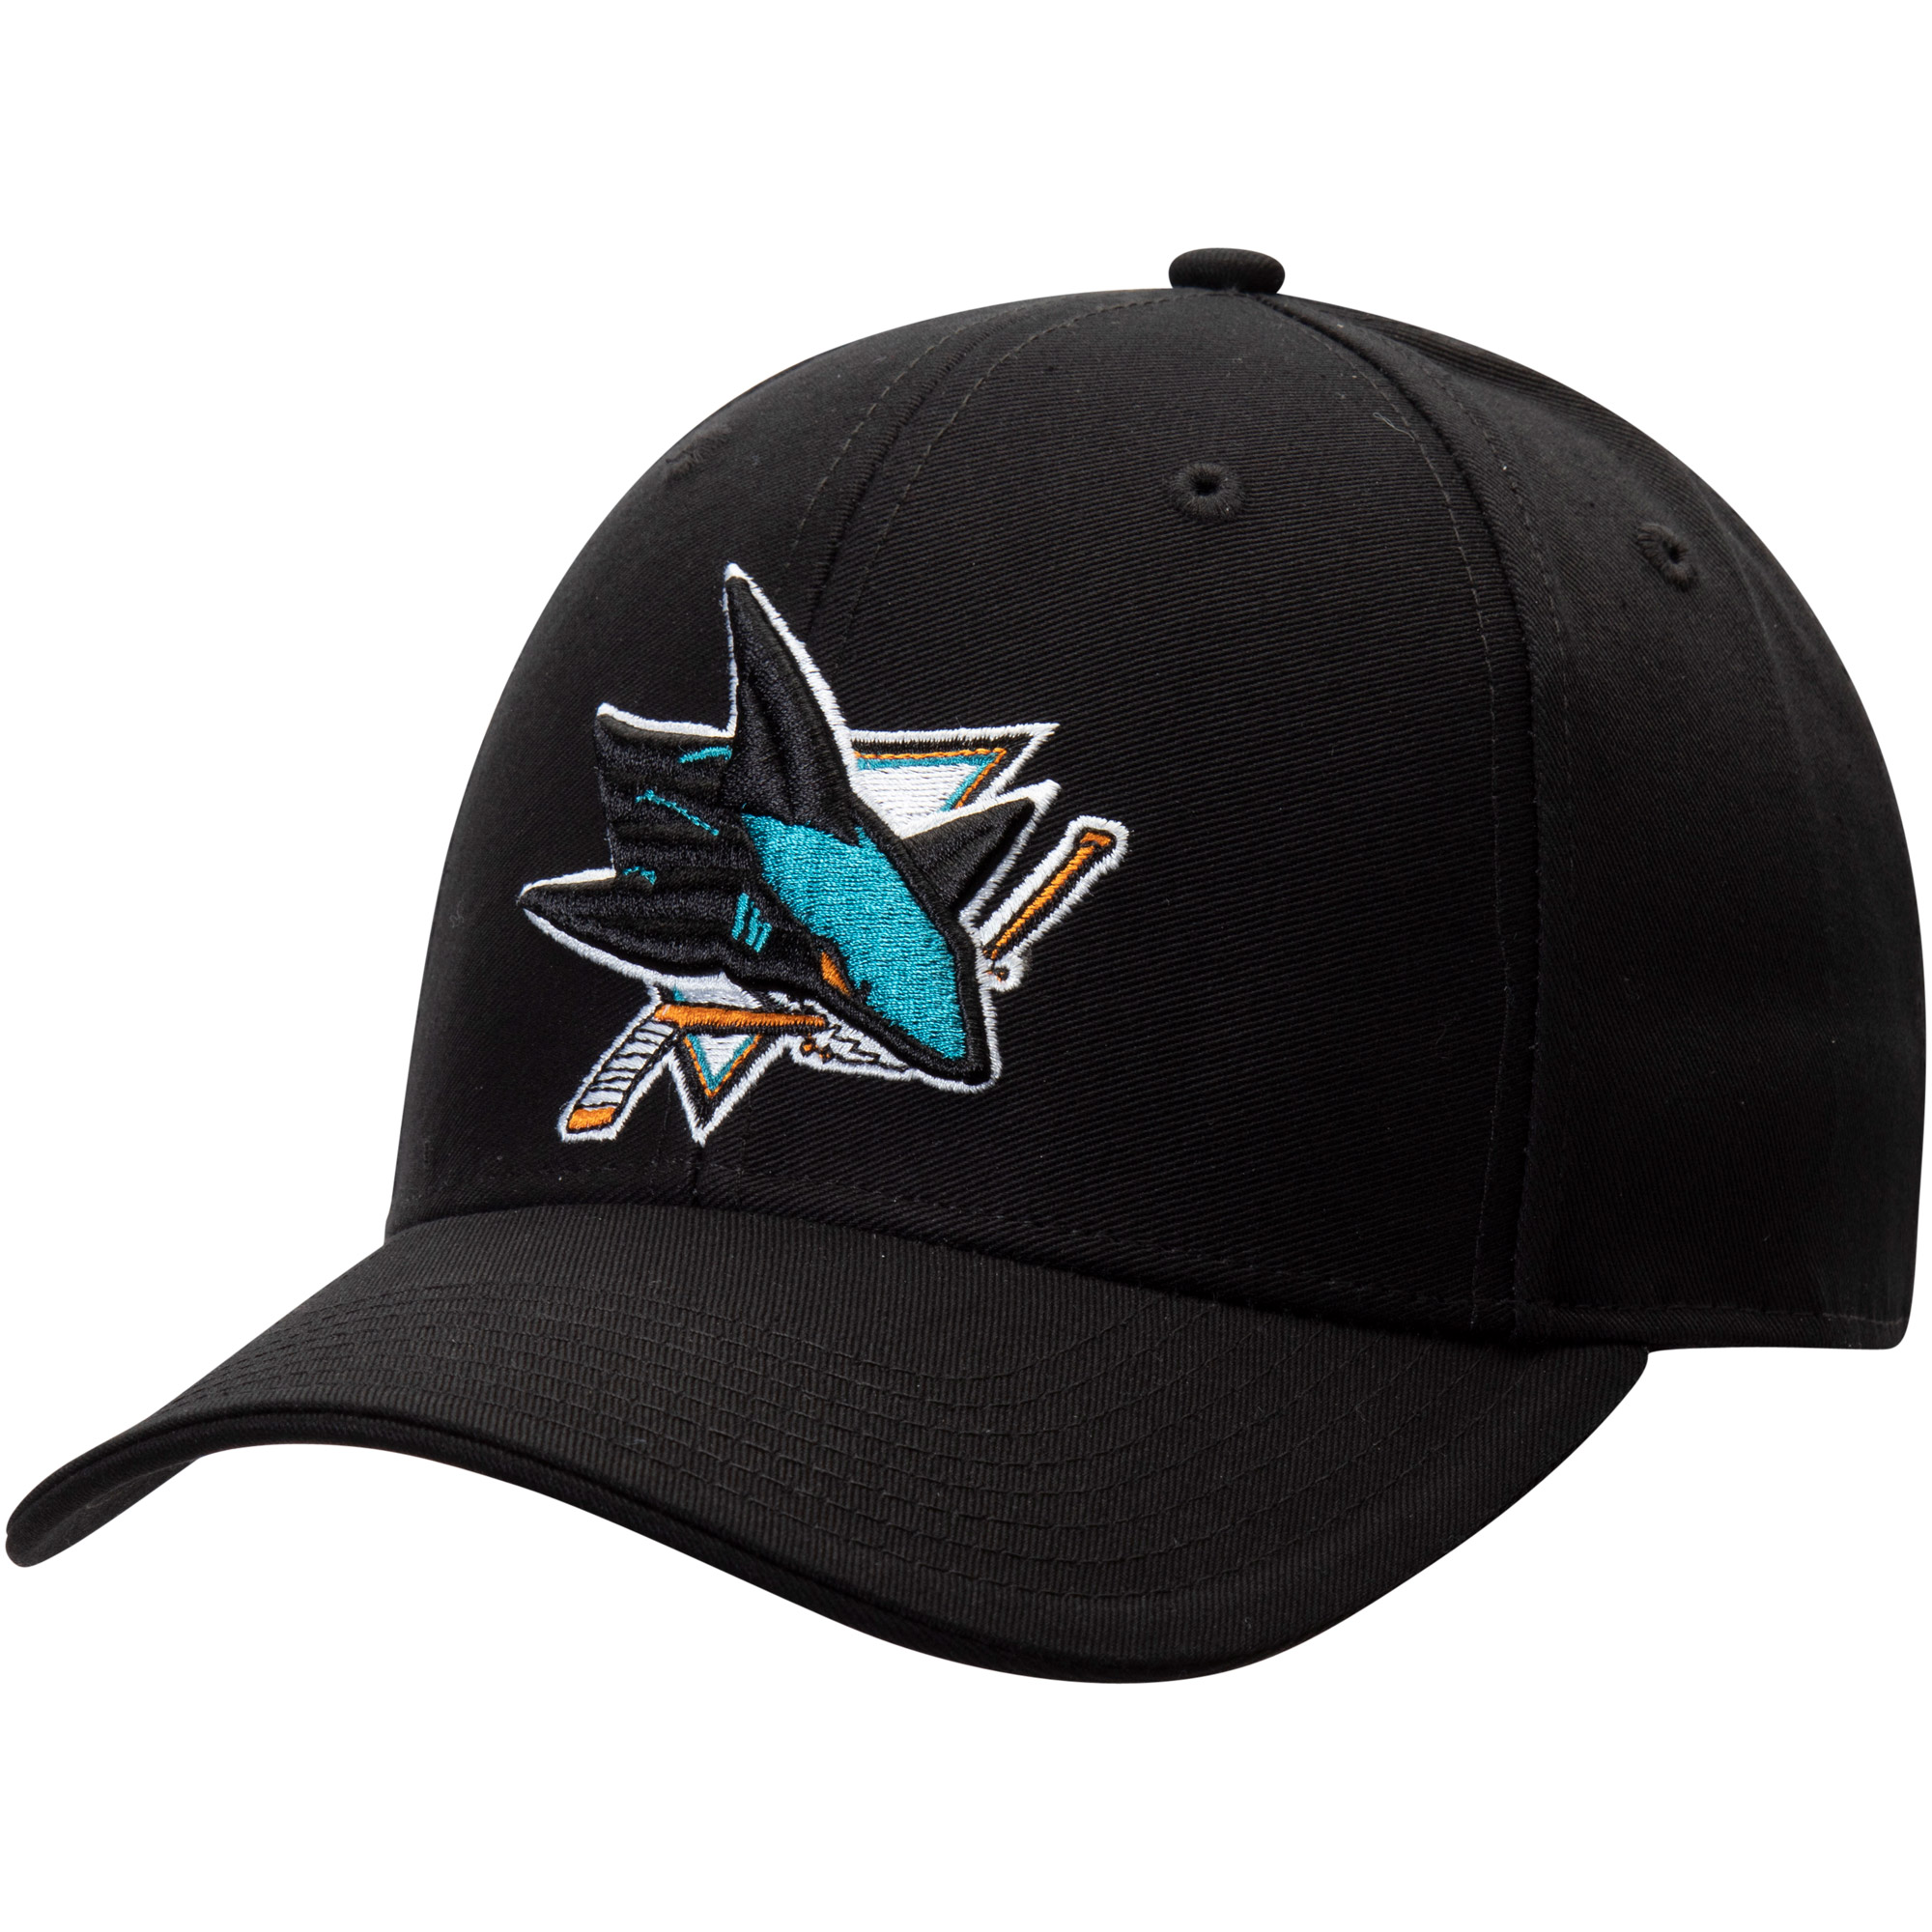 Men's Fanatics Branded Black San Jose Sharks Adjustable Hat - OSFA